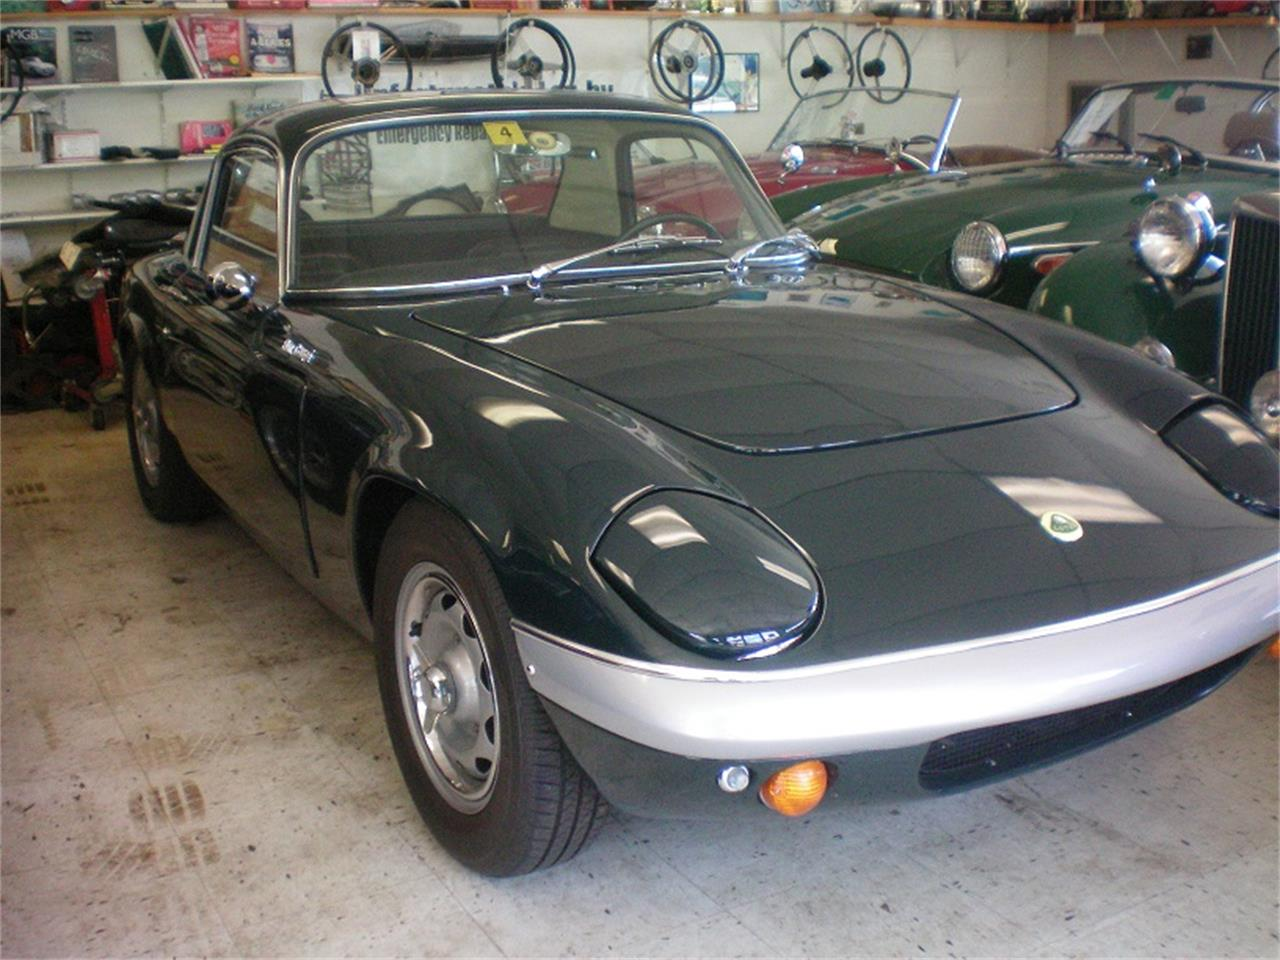 Lotus Elan For Sale >> 1969 Lotus Elan For Sale Classiccars Com Cc 1106306